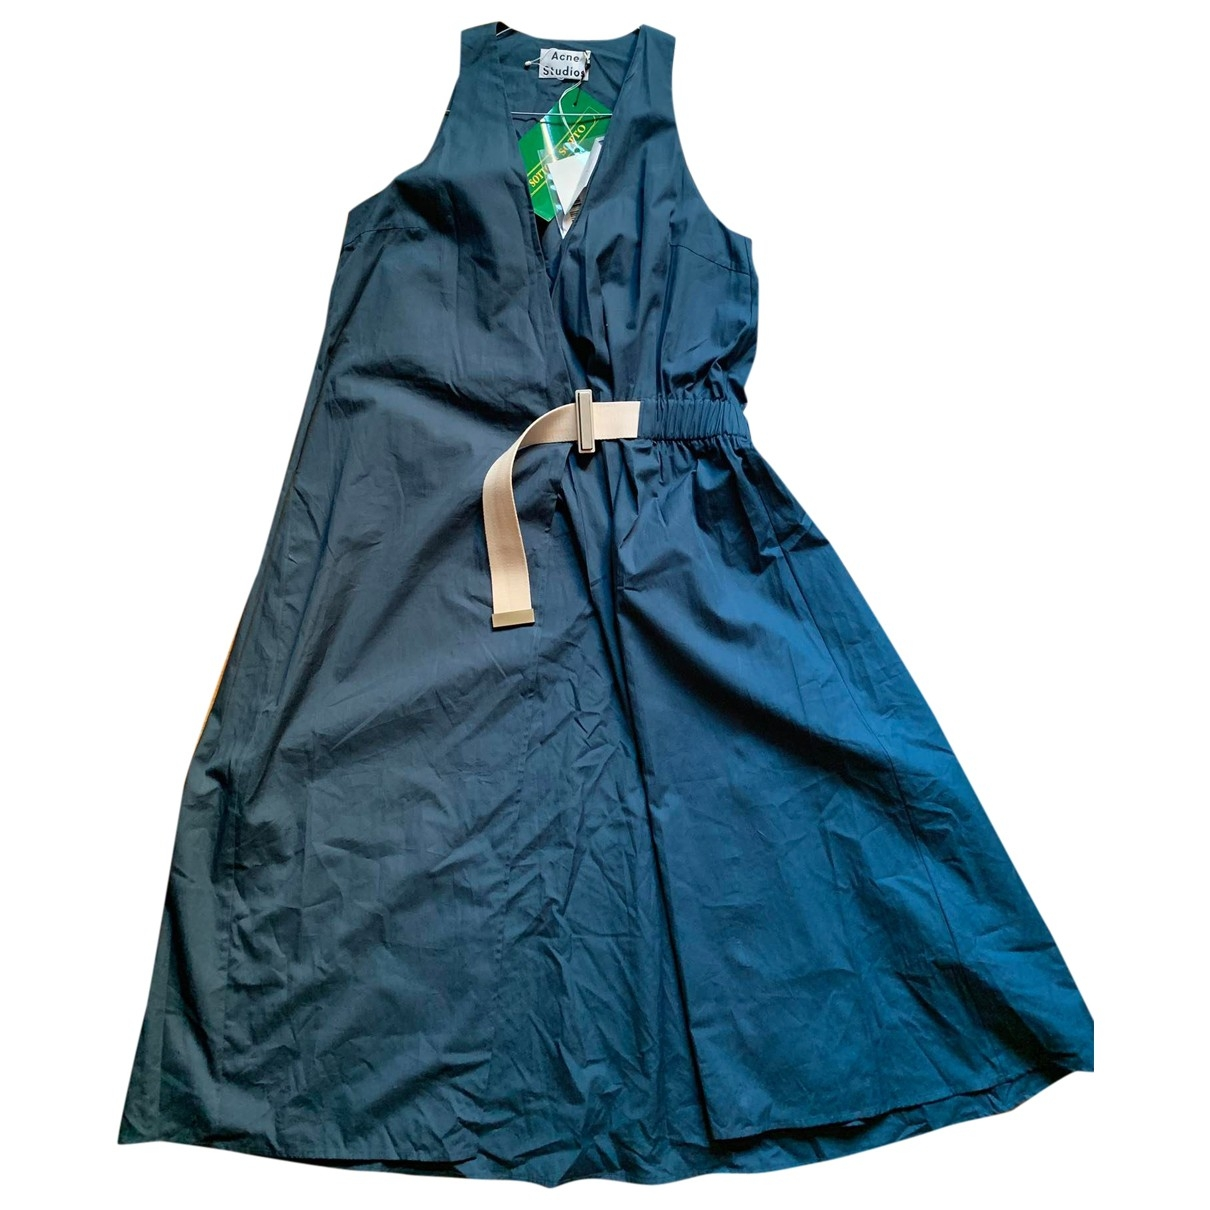 Acne Studios - Robe   pour femme en coton - vert